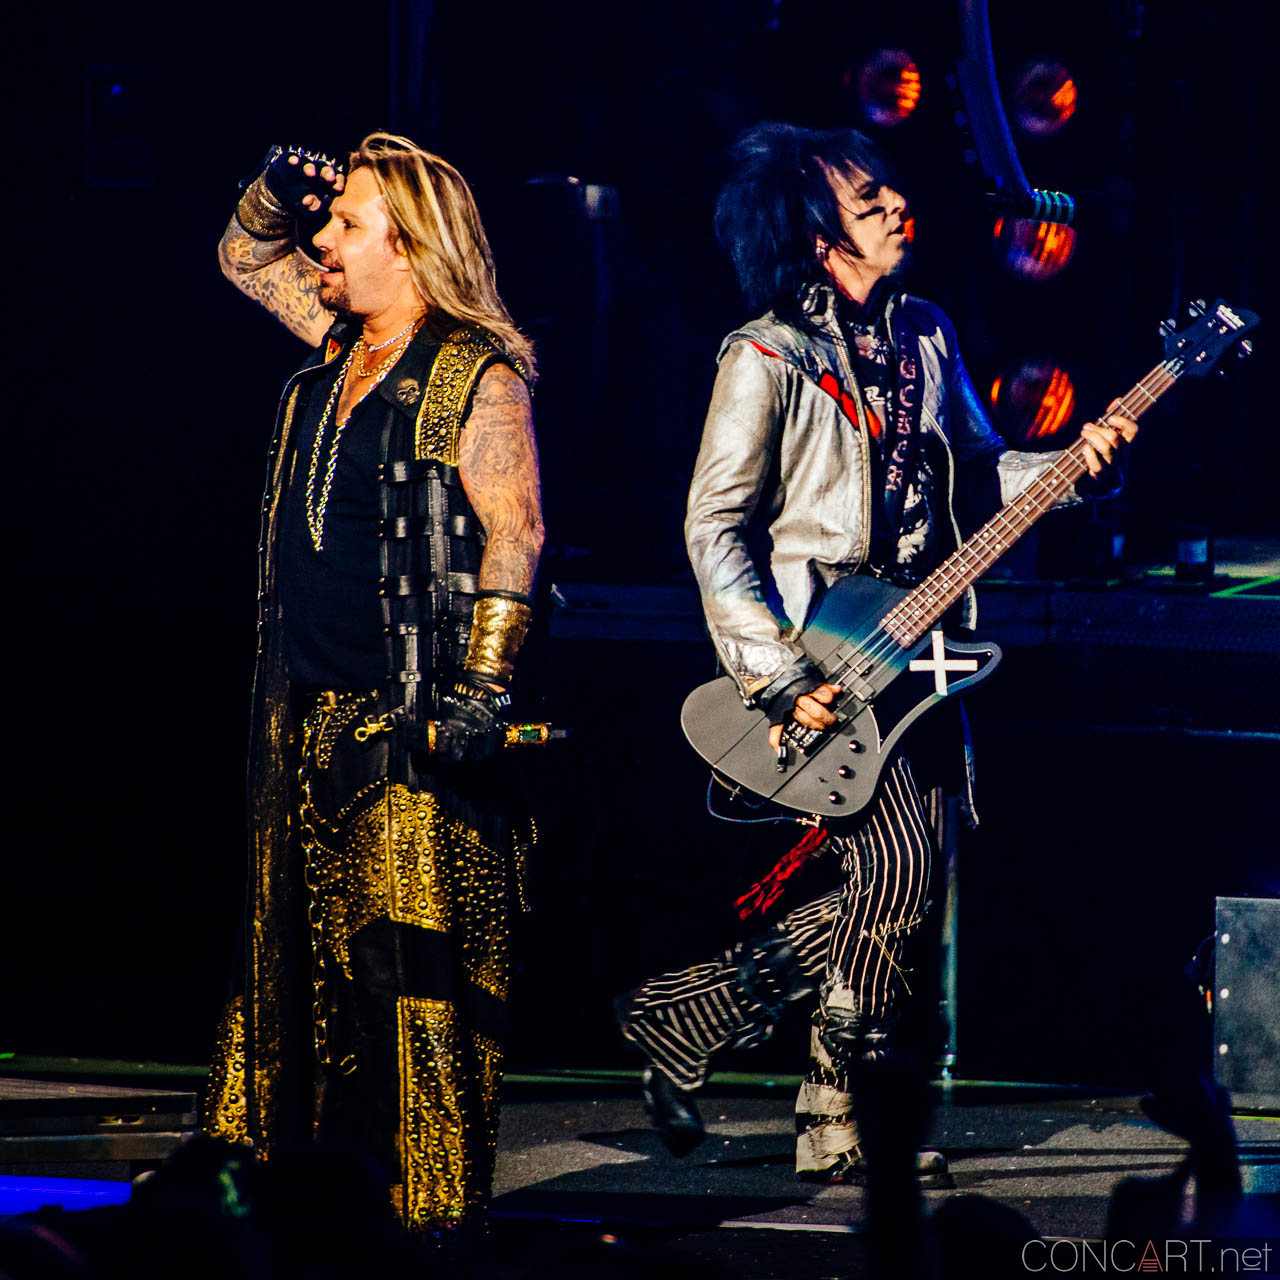 Mötley Crüe photo by Sean Molin 8